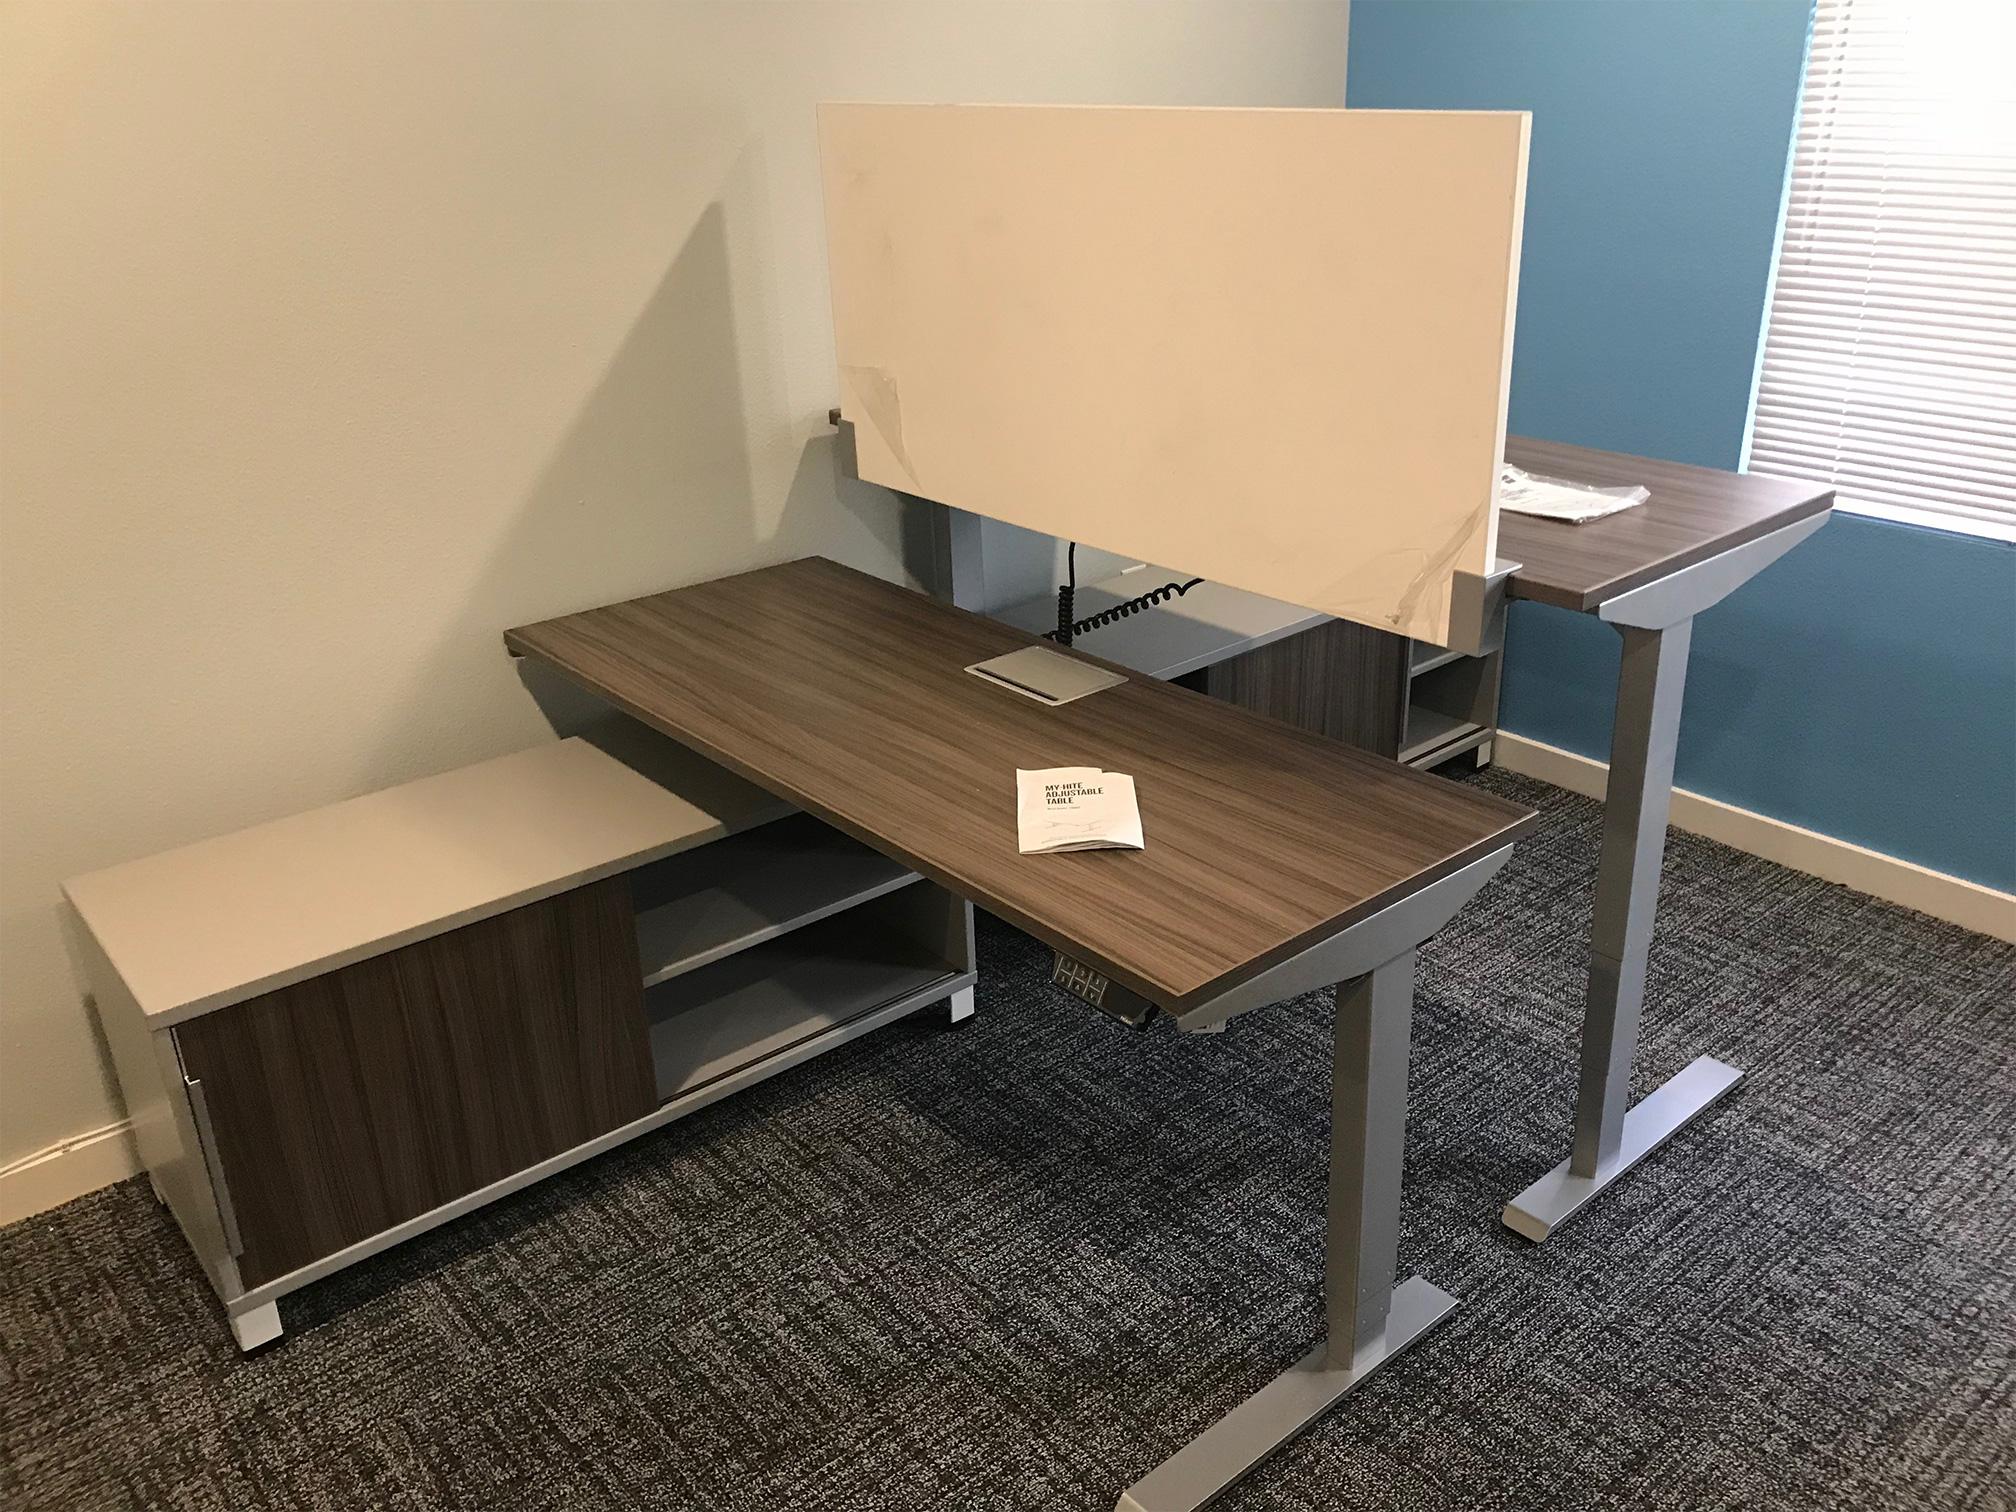 business-furniture-suppliers-in-jacksonville-florida-5-.jpg